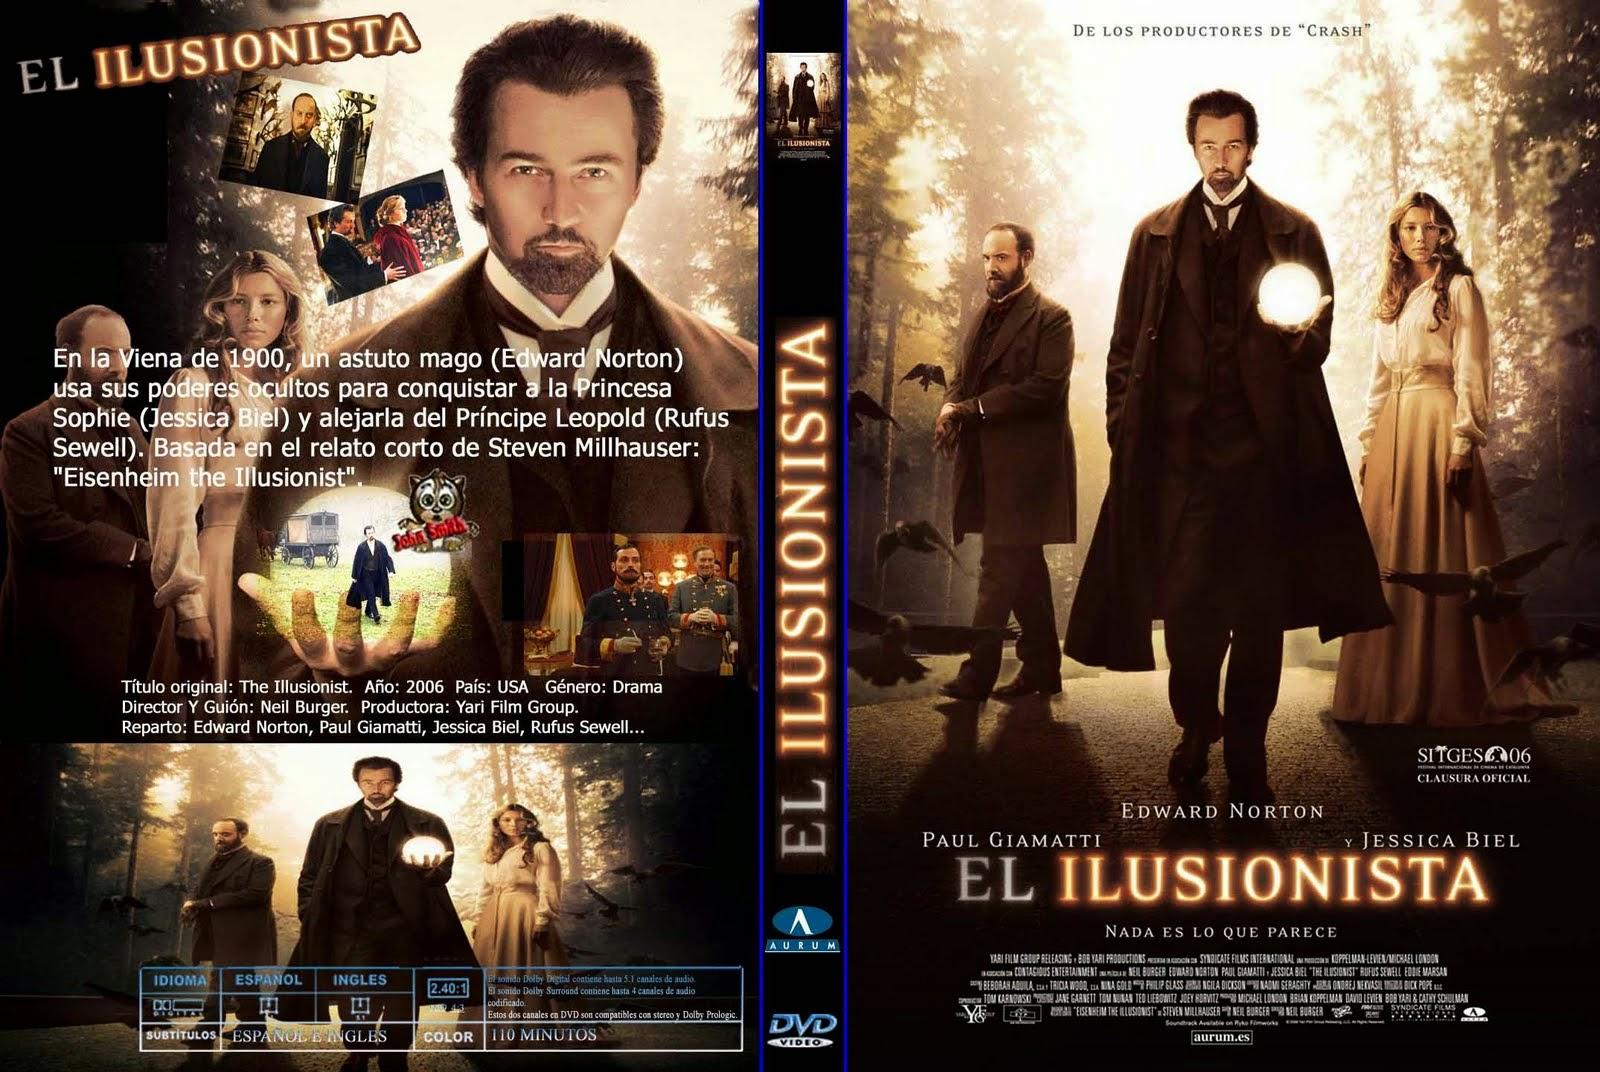 El Ilusionista DVD